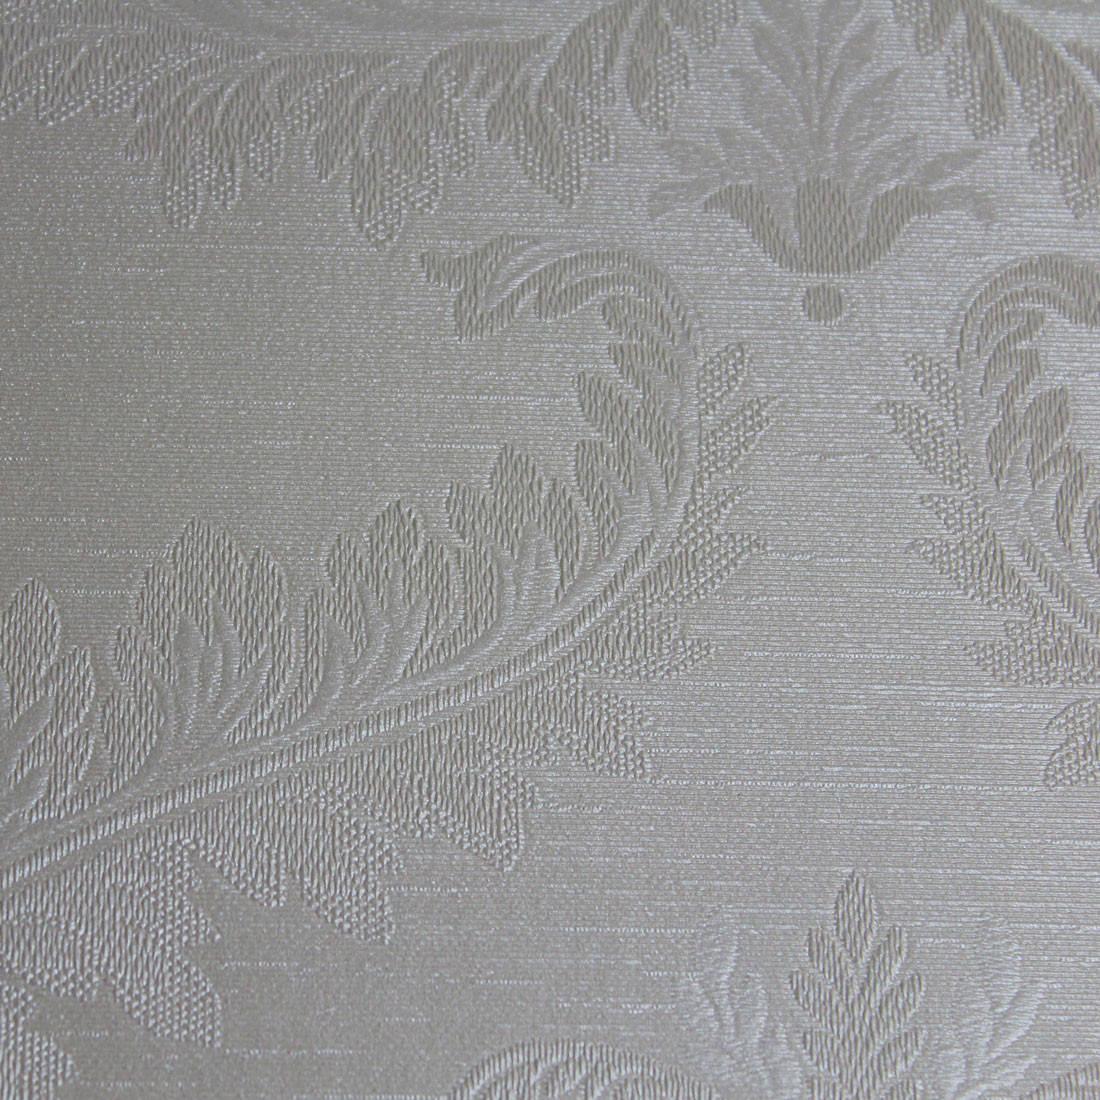 Papel de Parede Muresco Corium Arabesco Bege Escuro Textura